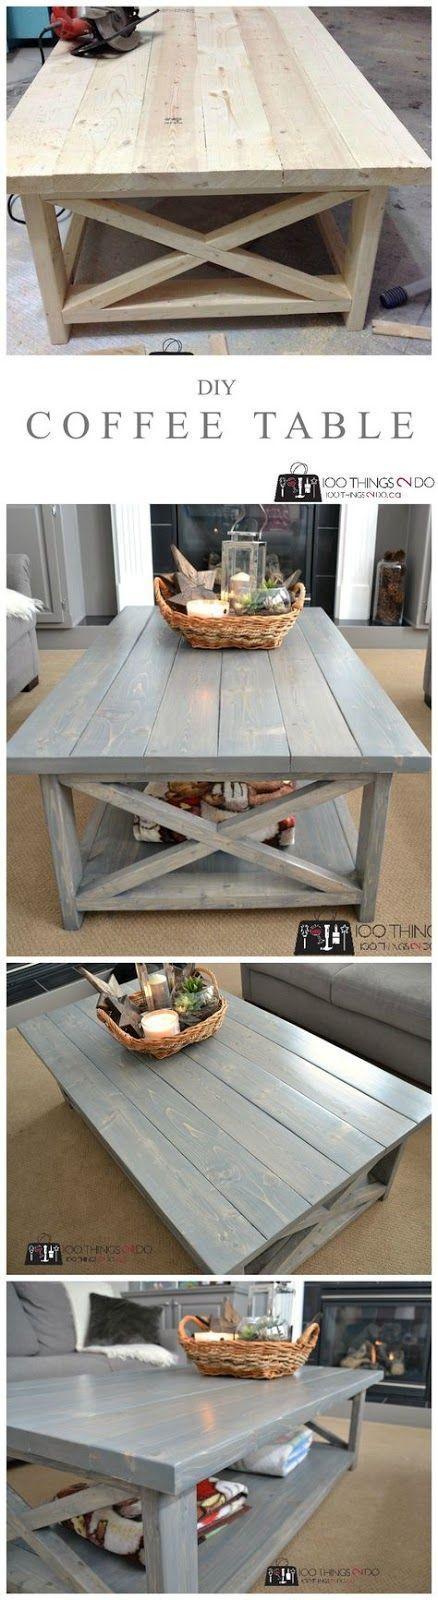 12 Beautifully Rustic DIY Farmhouse Tables (scheduled via http://www.tailwindapp.com?utm_source=pinterest&utm_medium=twpin&utm_content=post94910223&utm_campaign=scheduler_attribution)